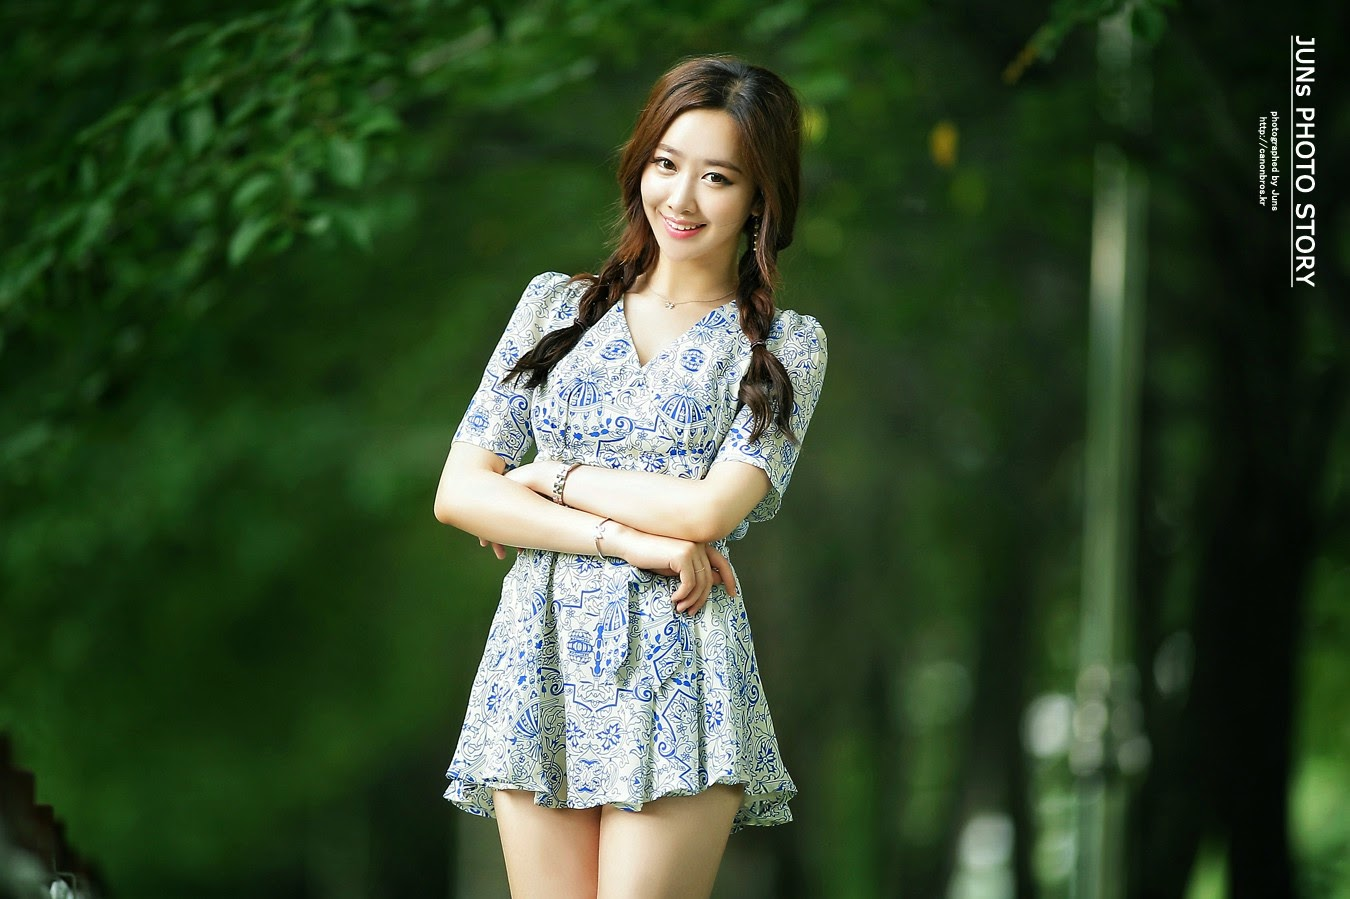 4 Shin Hae Ri - very cute asian girl-girlcute4u.blogspot.com